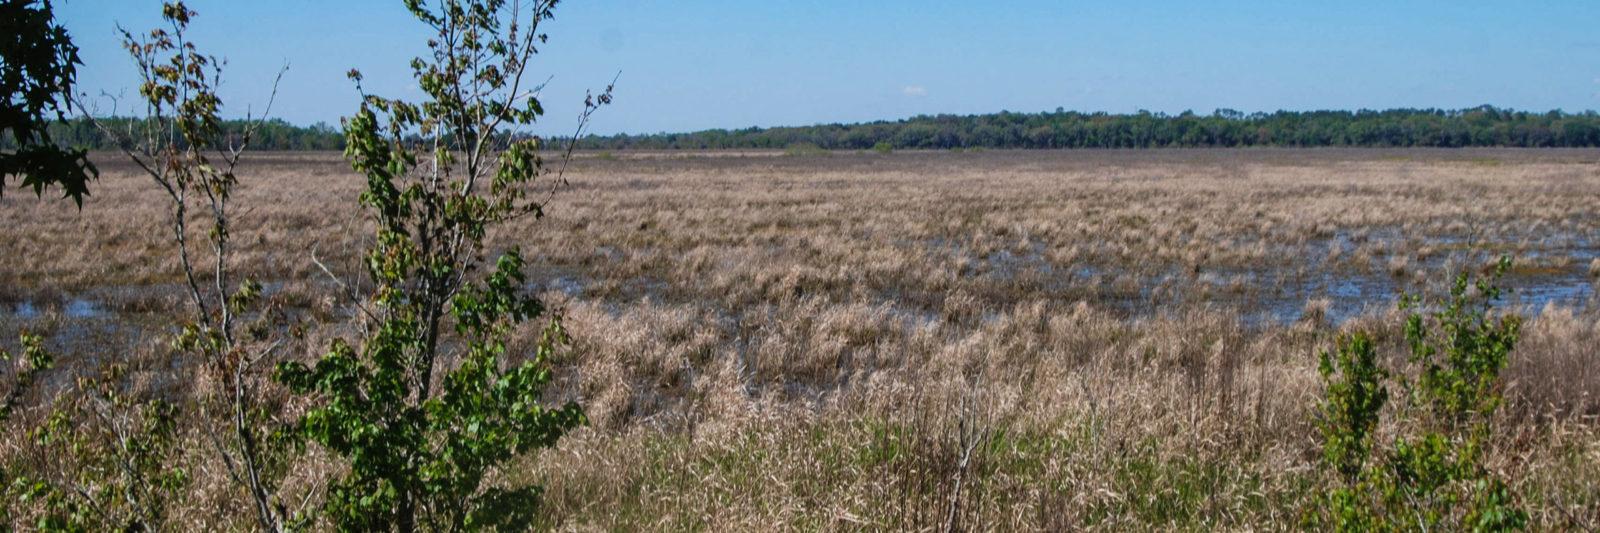 South Levee Barr Hammock Preserve